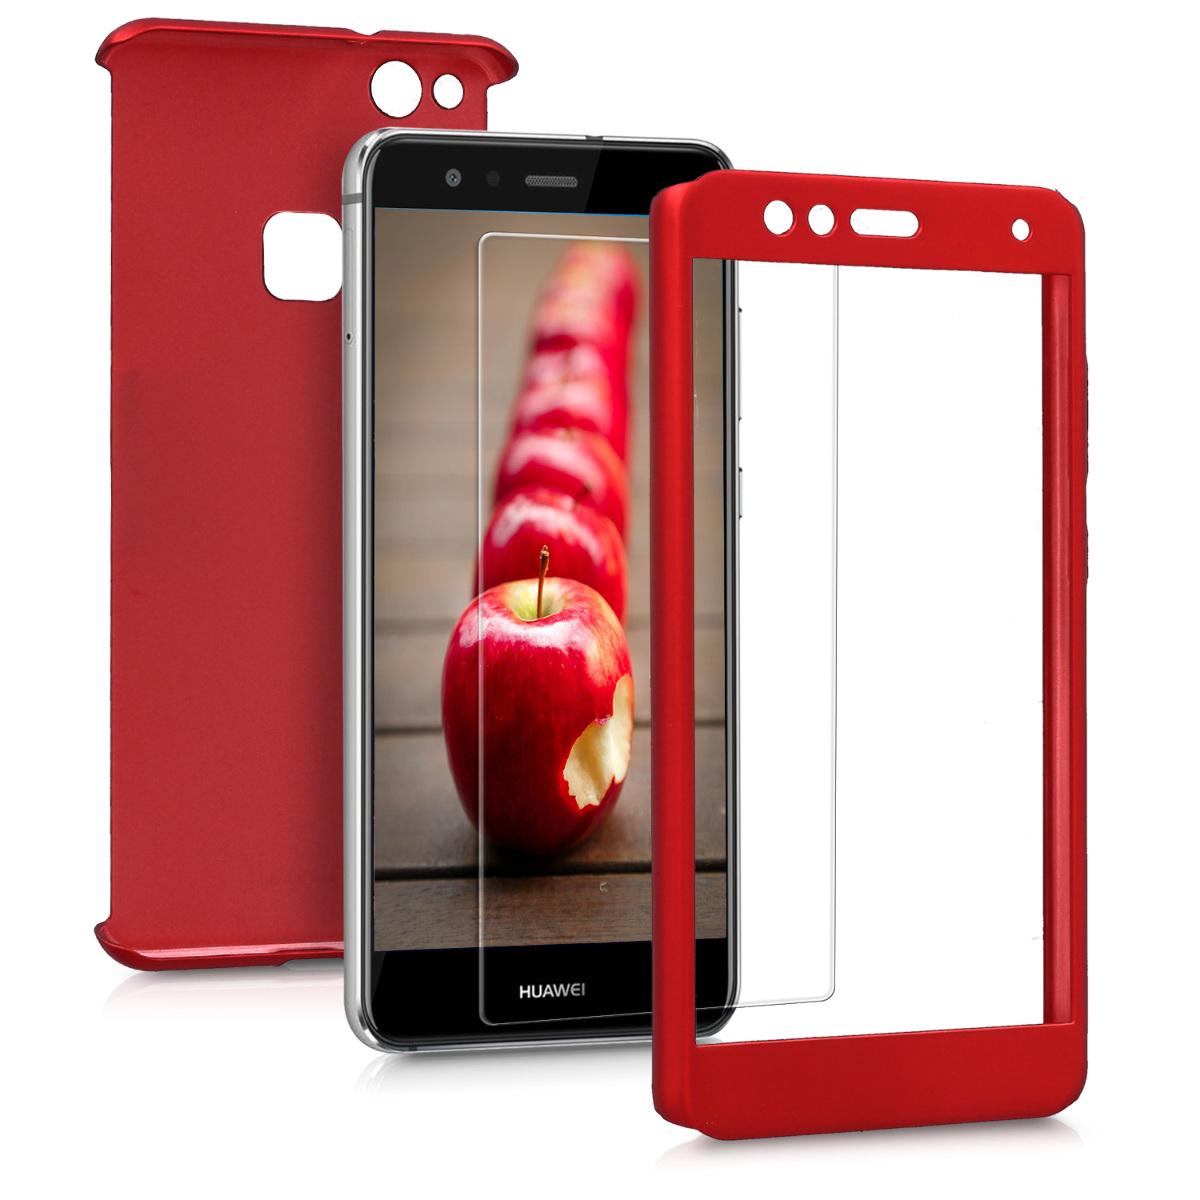 KW Full Body Θήκη Huawei P10 Lite & Tempered Glass - Κόκκινο/ Μεταλλικό  (43763.36)